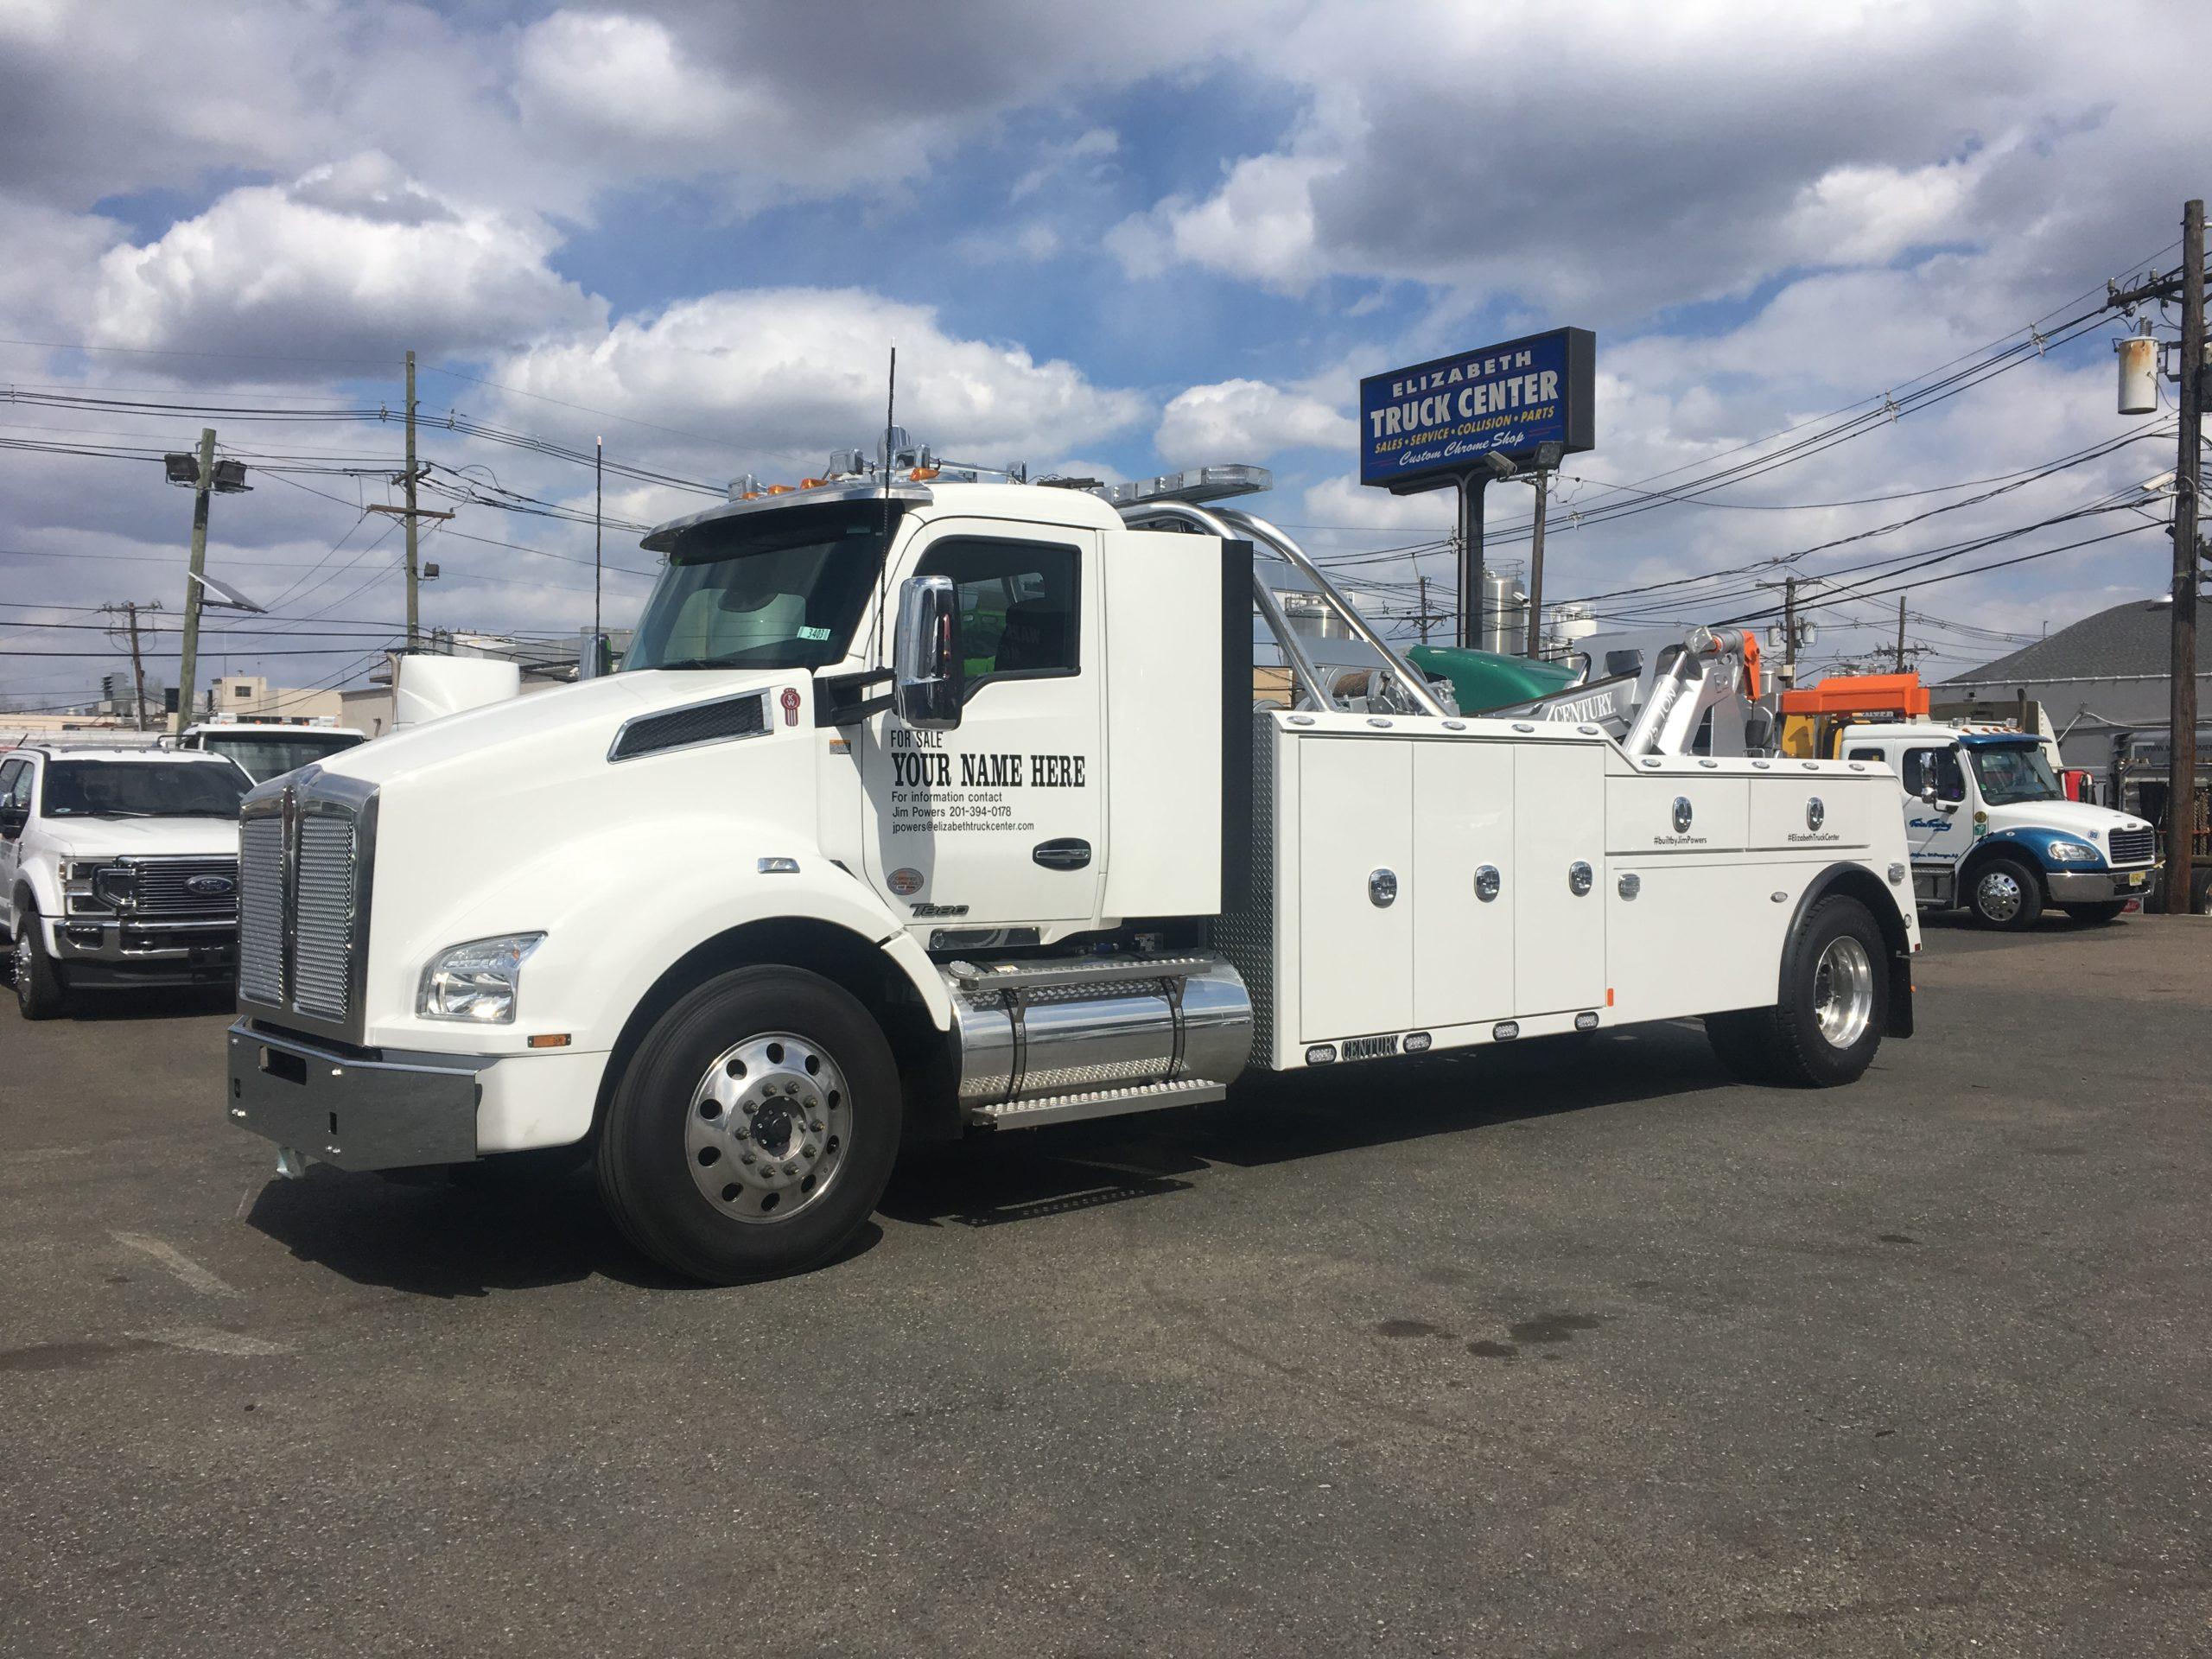 2206: 2020 Kenworth T-880 w Century 5130 / 25 Ton Tow Truck